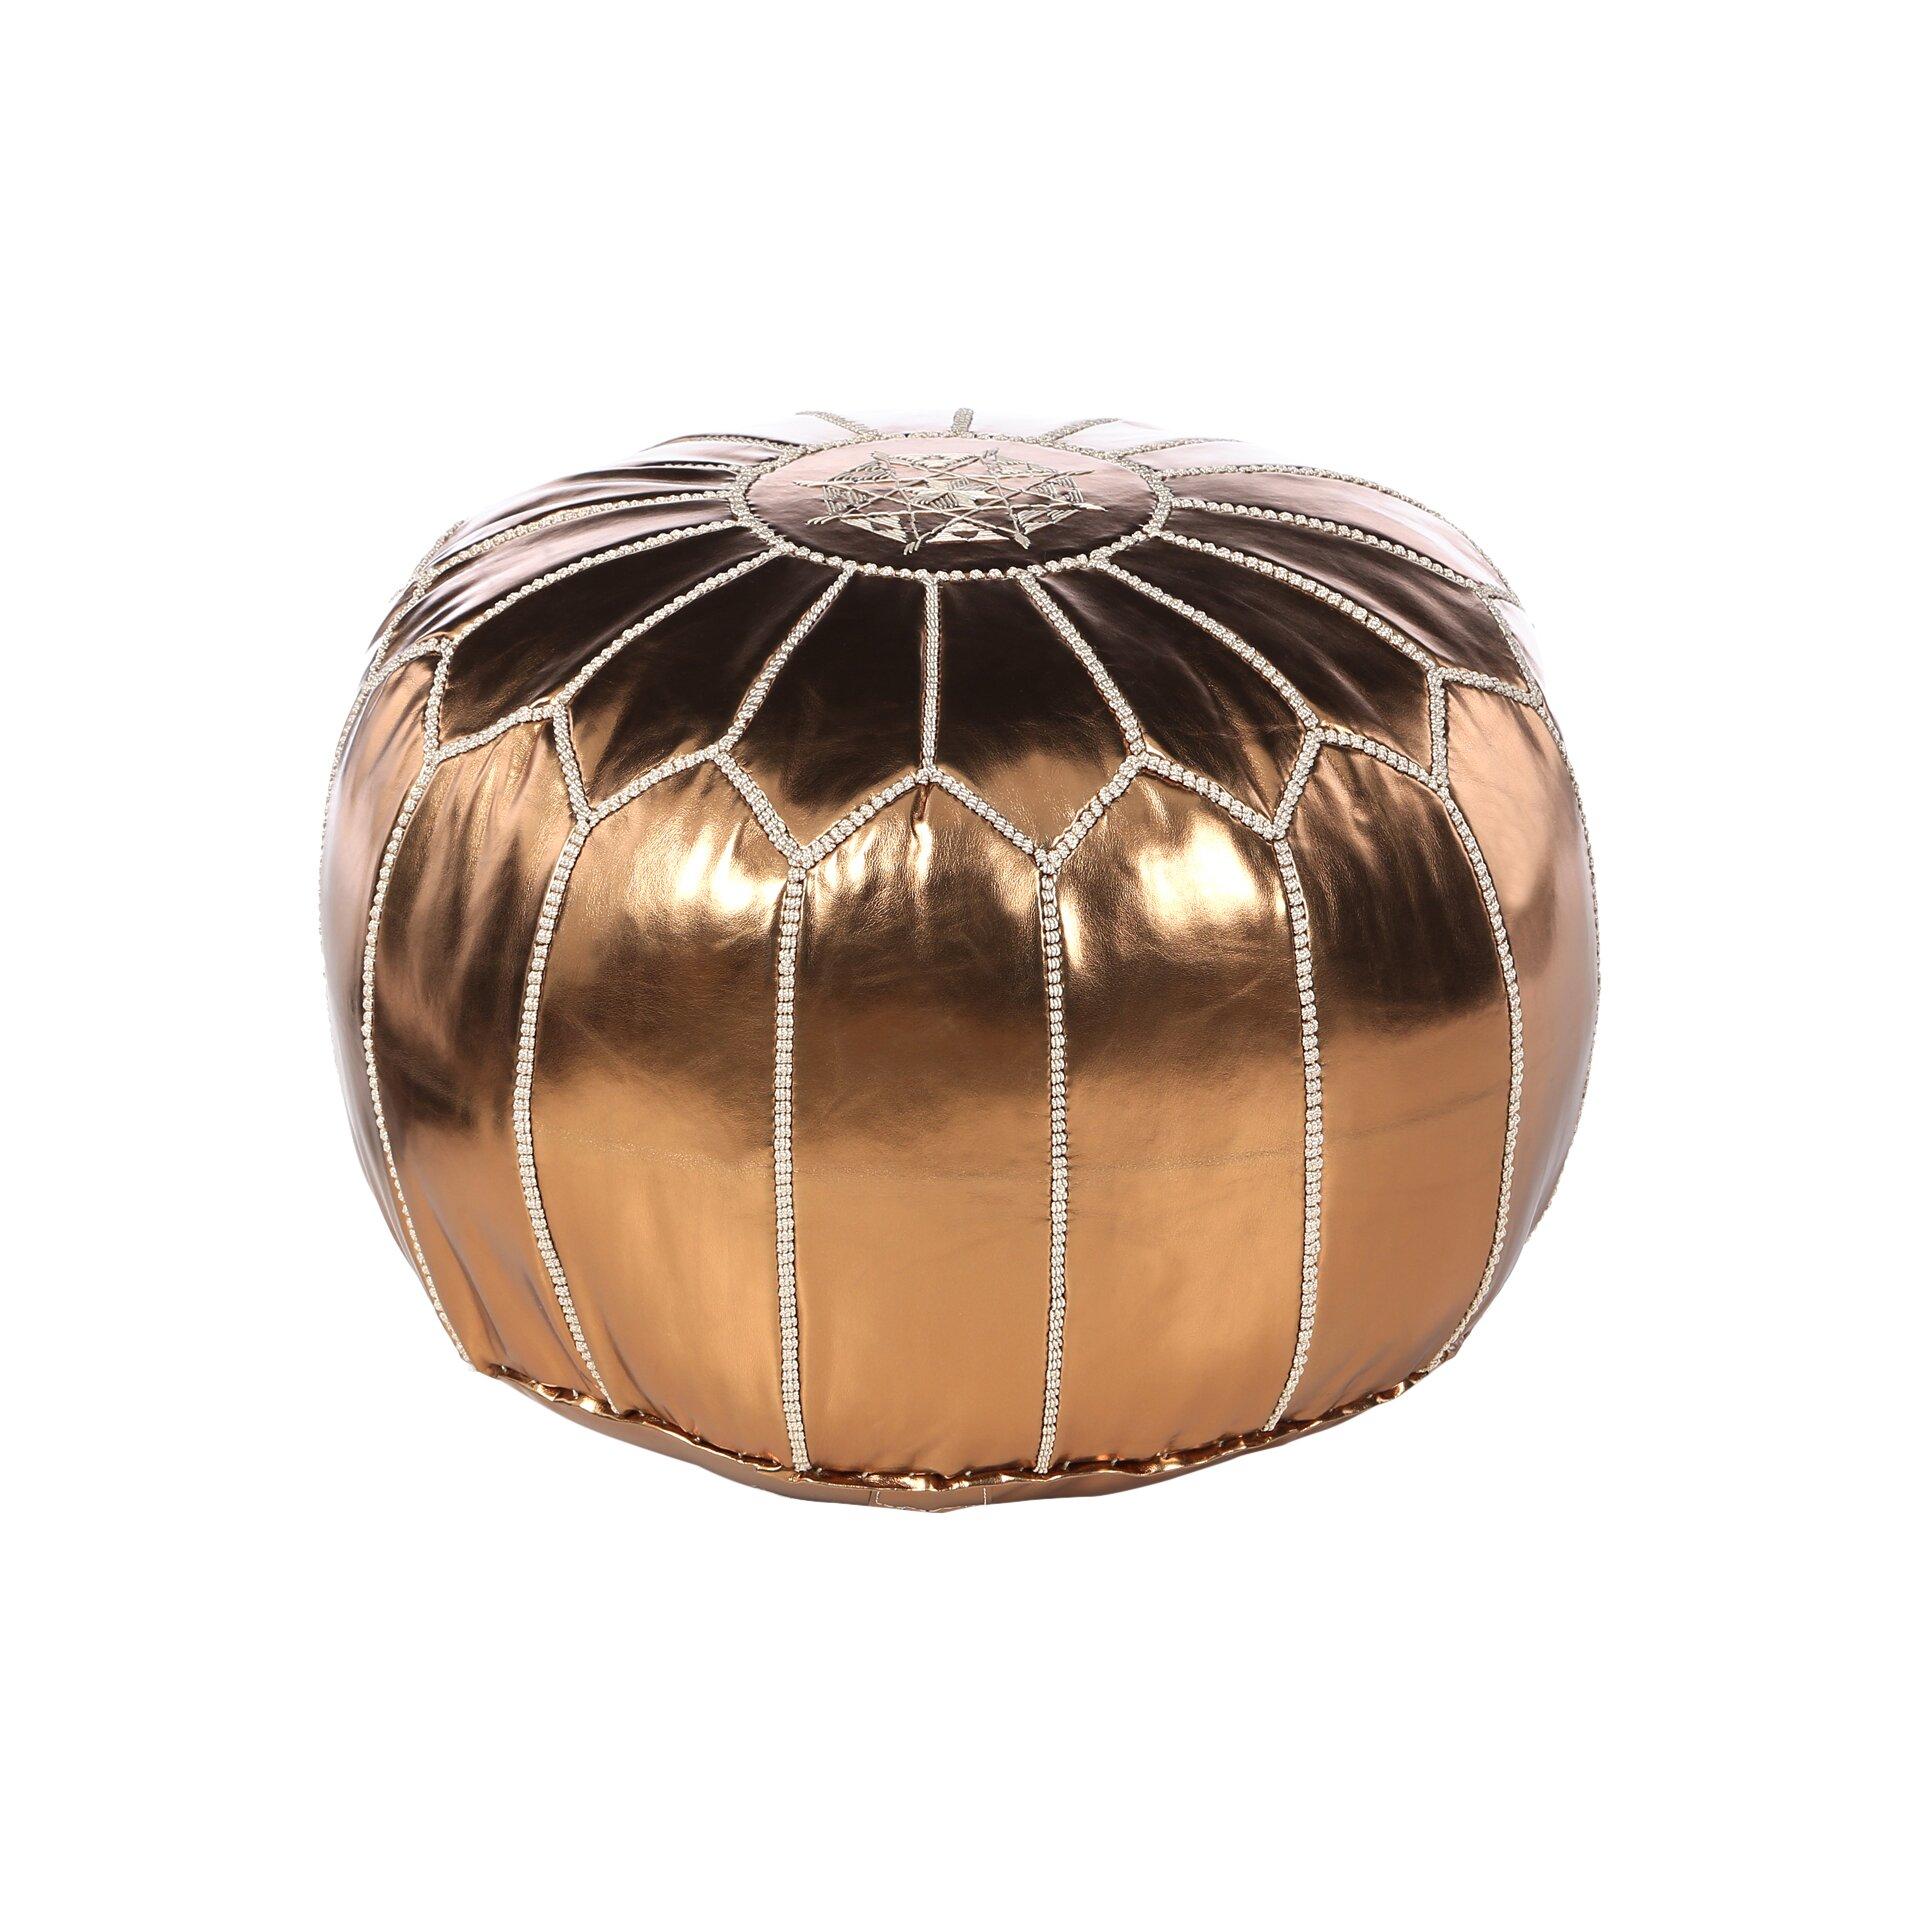 mouassine metallic pouf ottoman reviews allmodern. Black Bedroom Furniture Sets. Home Design Ideas